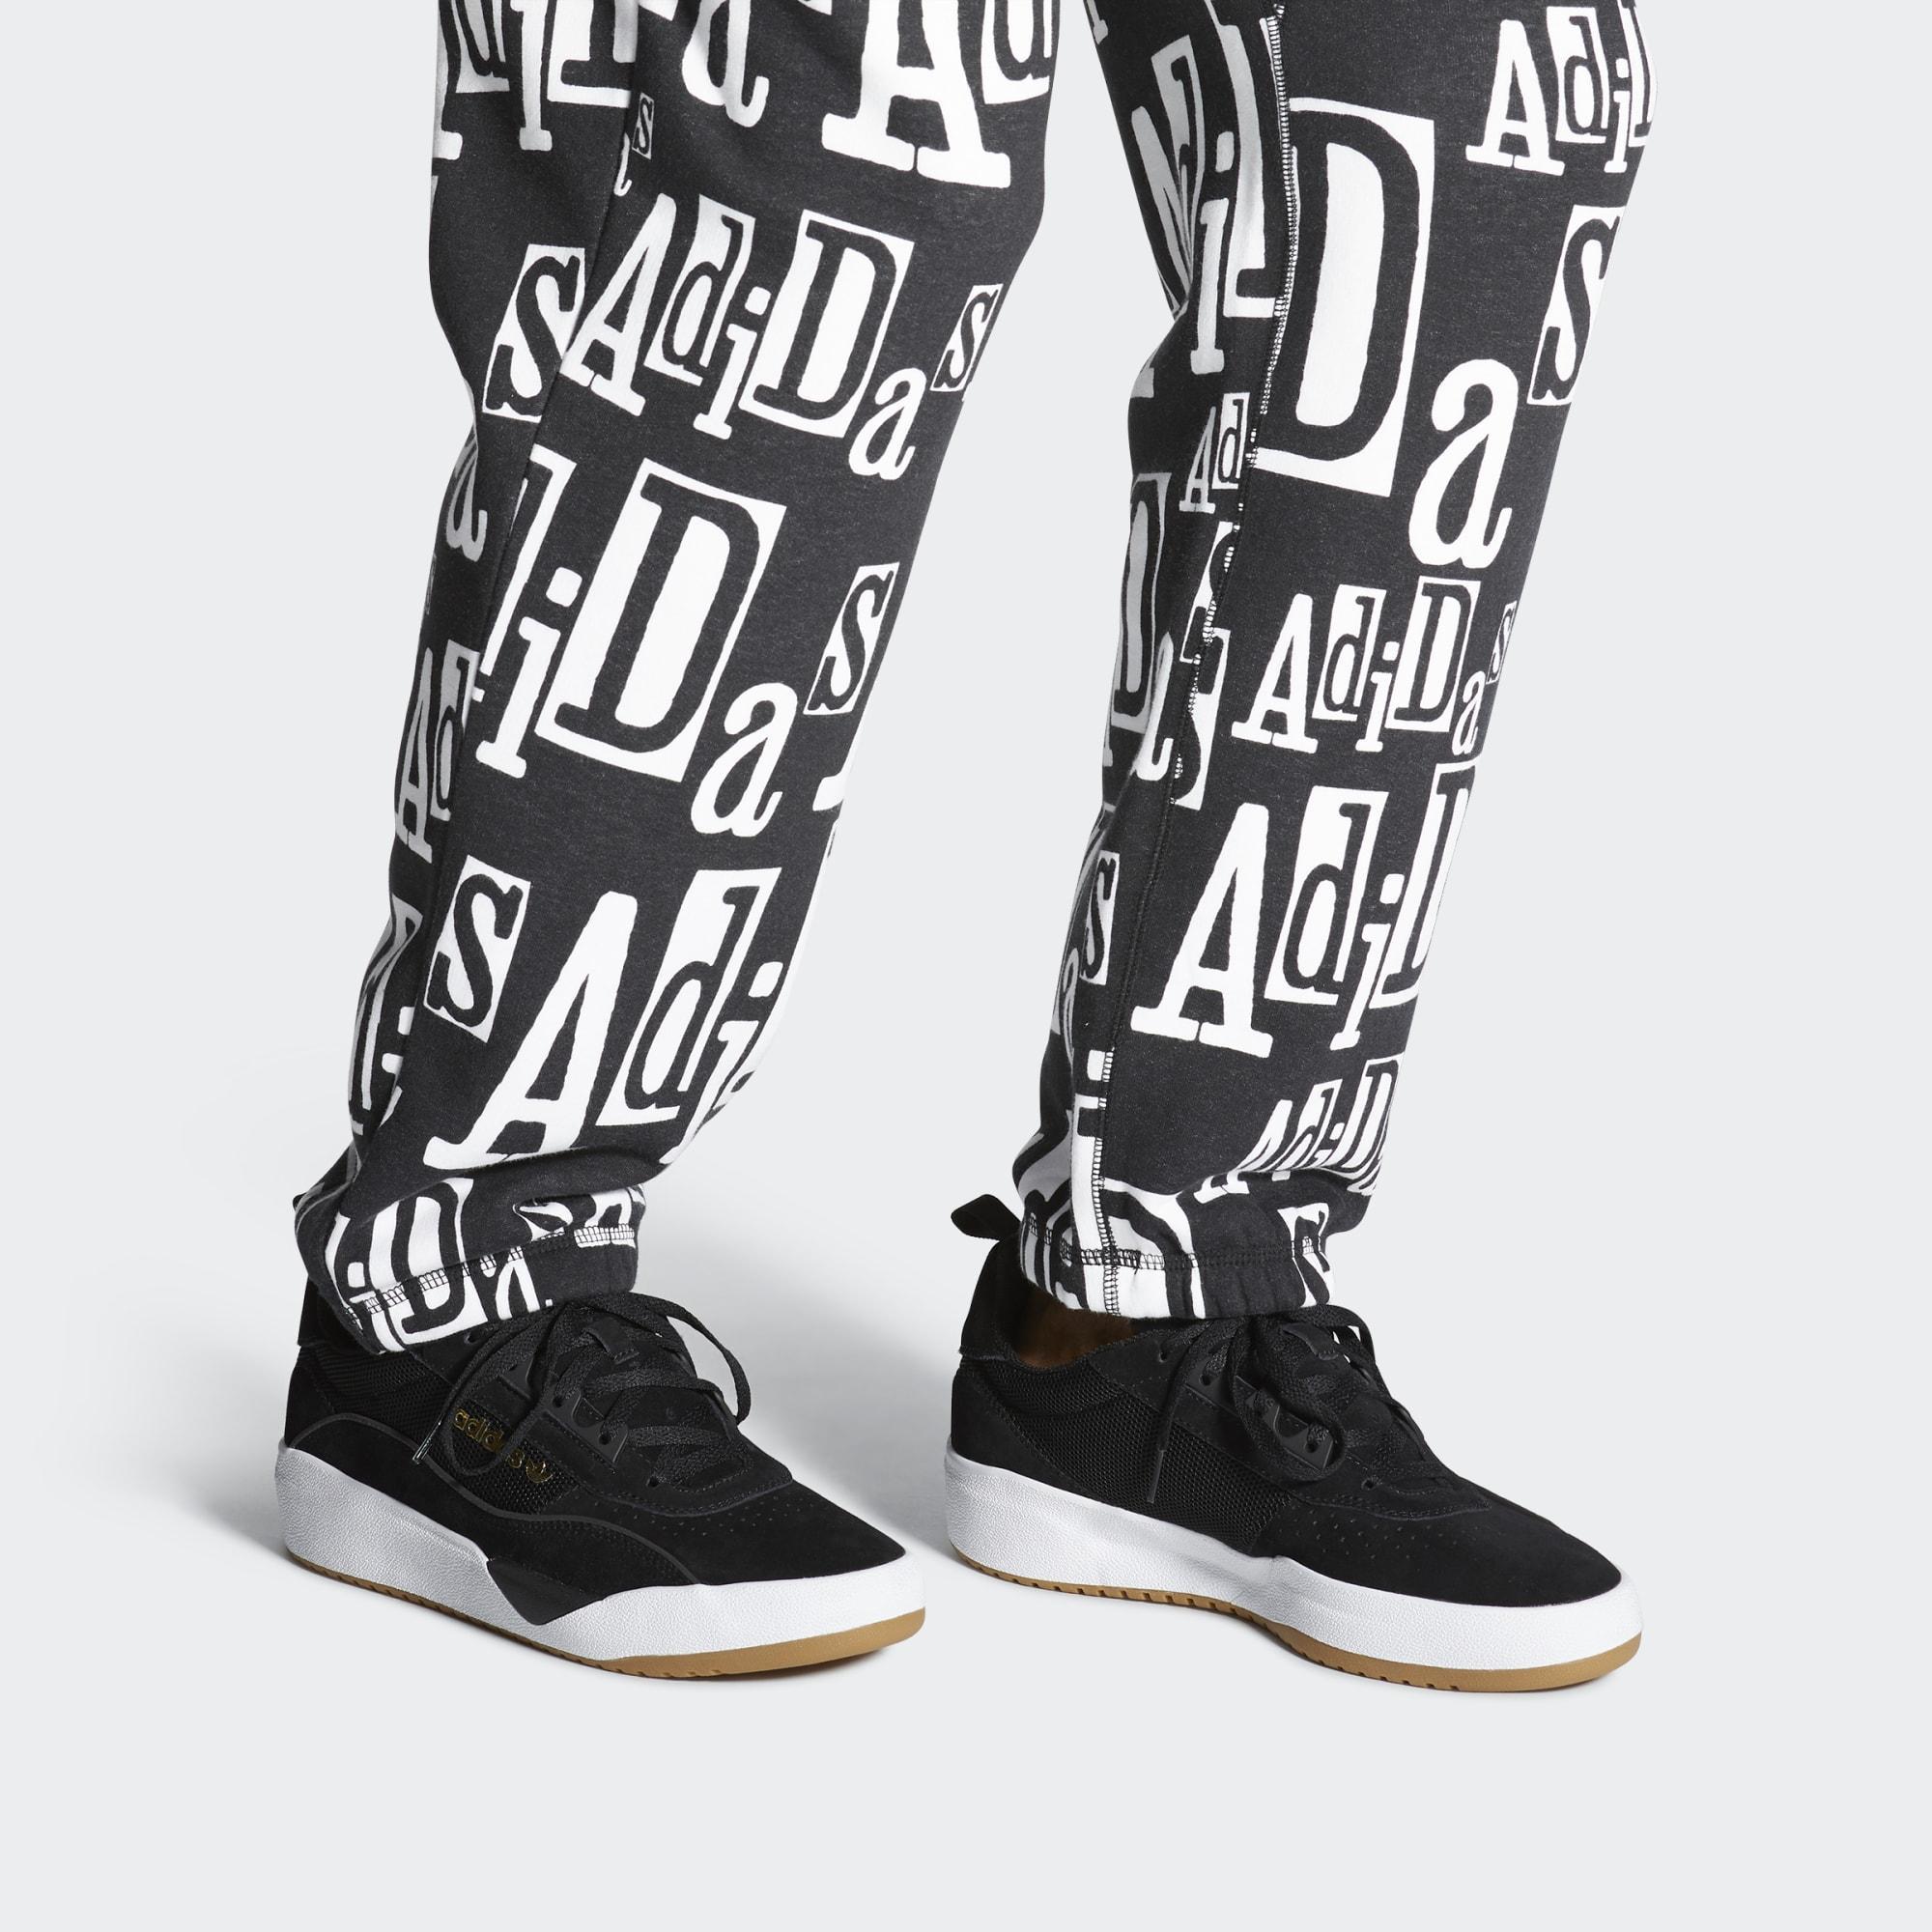 Zapatilla Liberty Cup adidas de Ante de color Negro para hombre